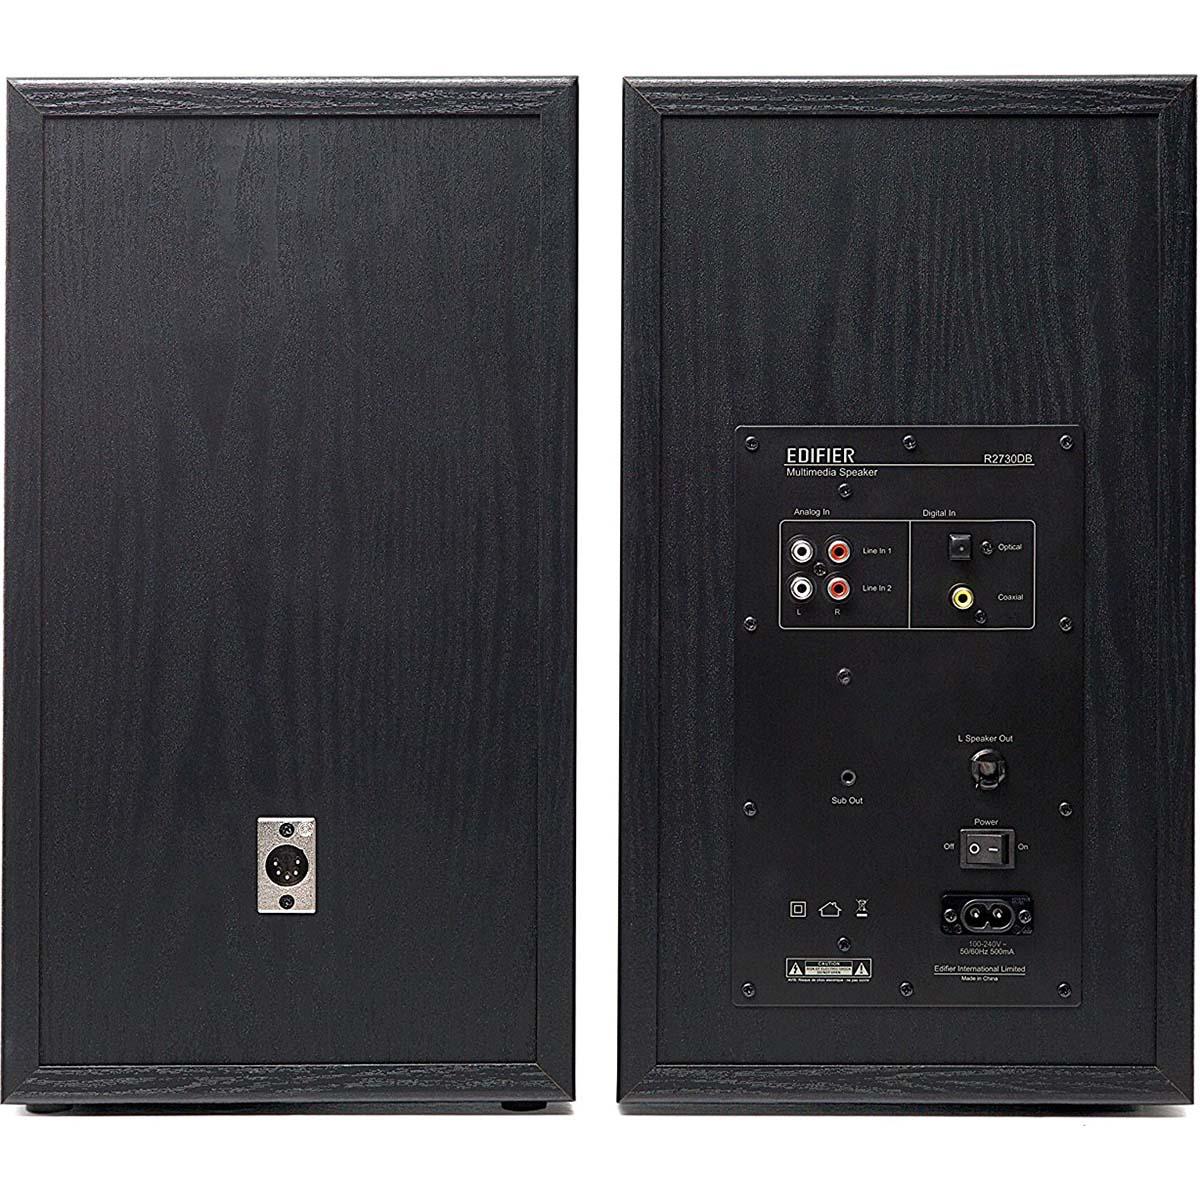 Edifier R2730DB Caixa de Som, 136W RMS, Bivolt